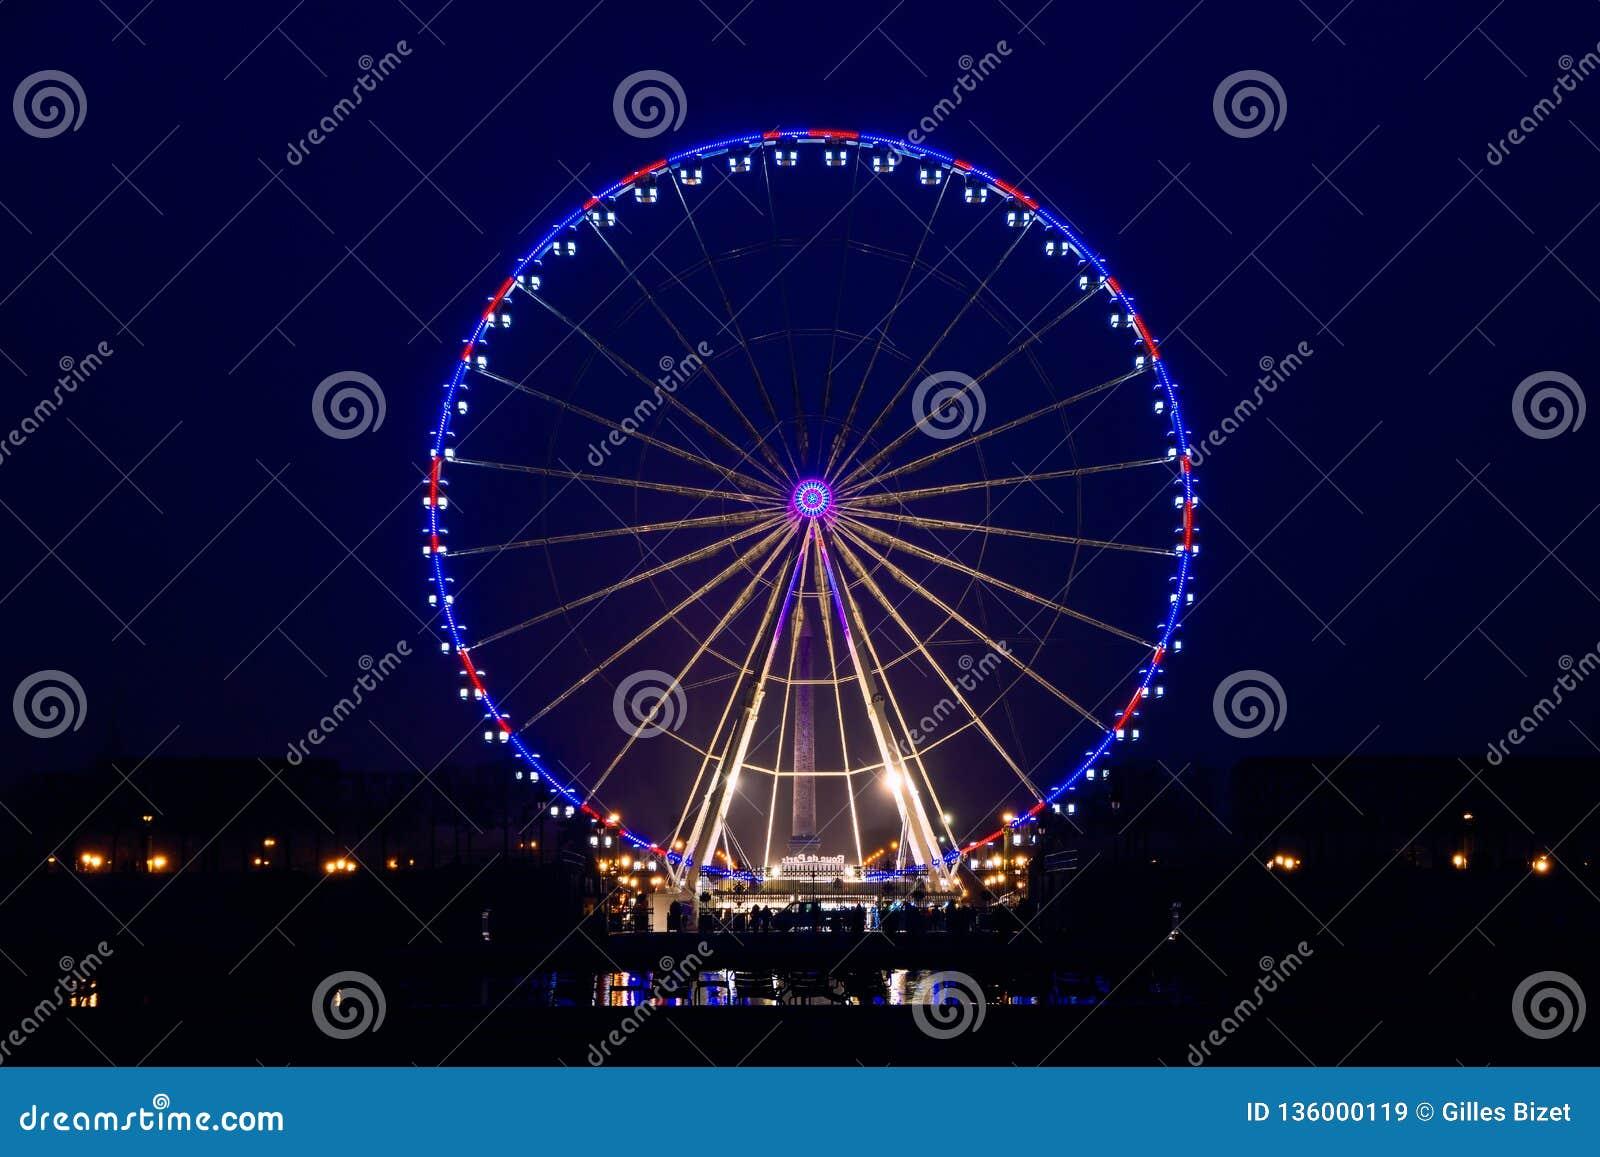 Night view of big wheel in Paris